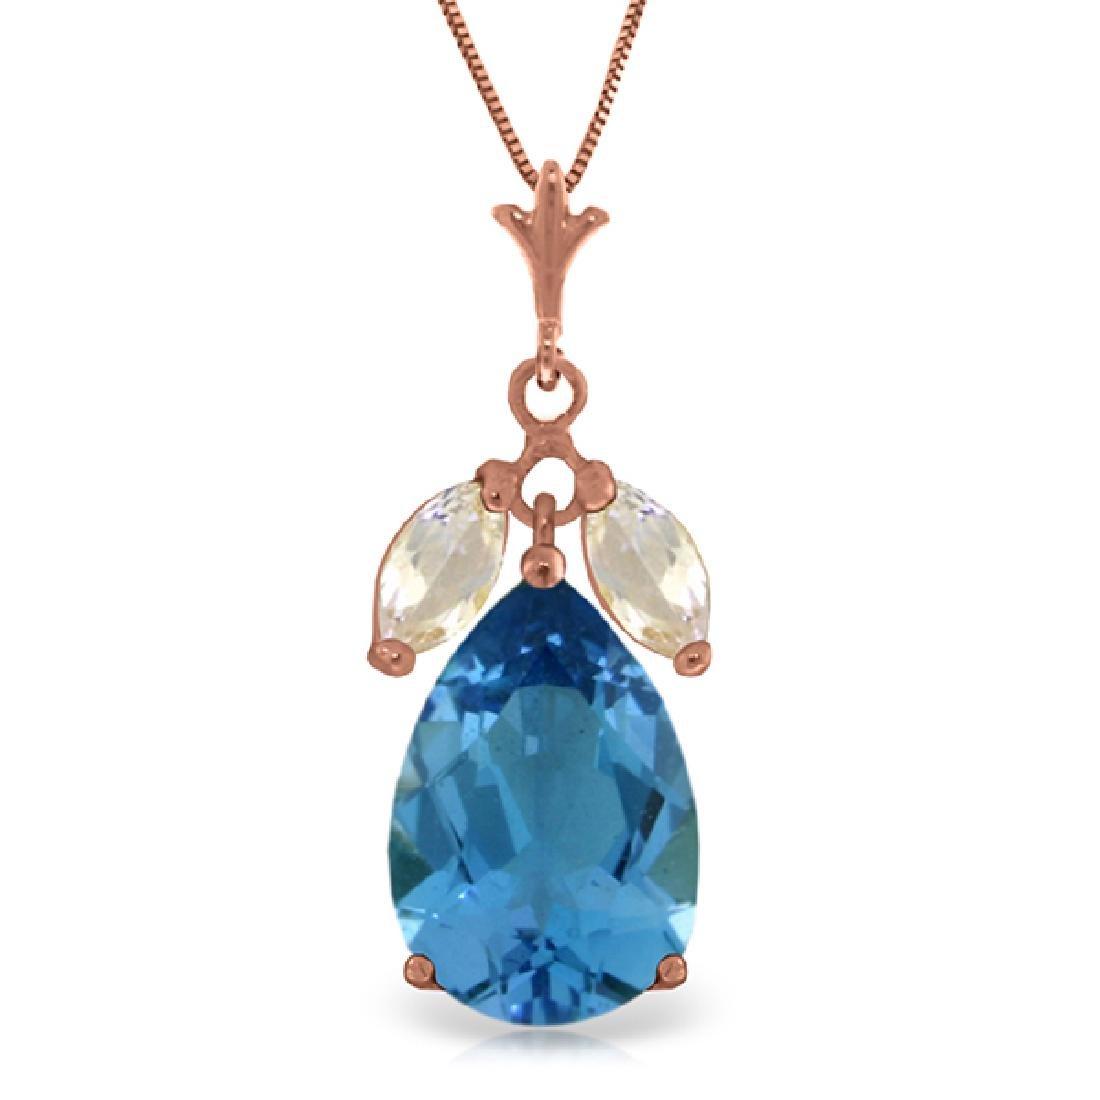 Genuine 6.5 ctw Blue Topaz & White Topaz Necklace